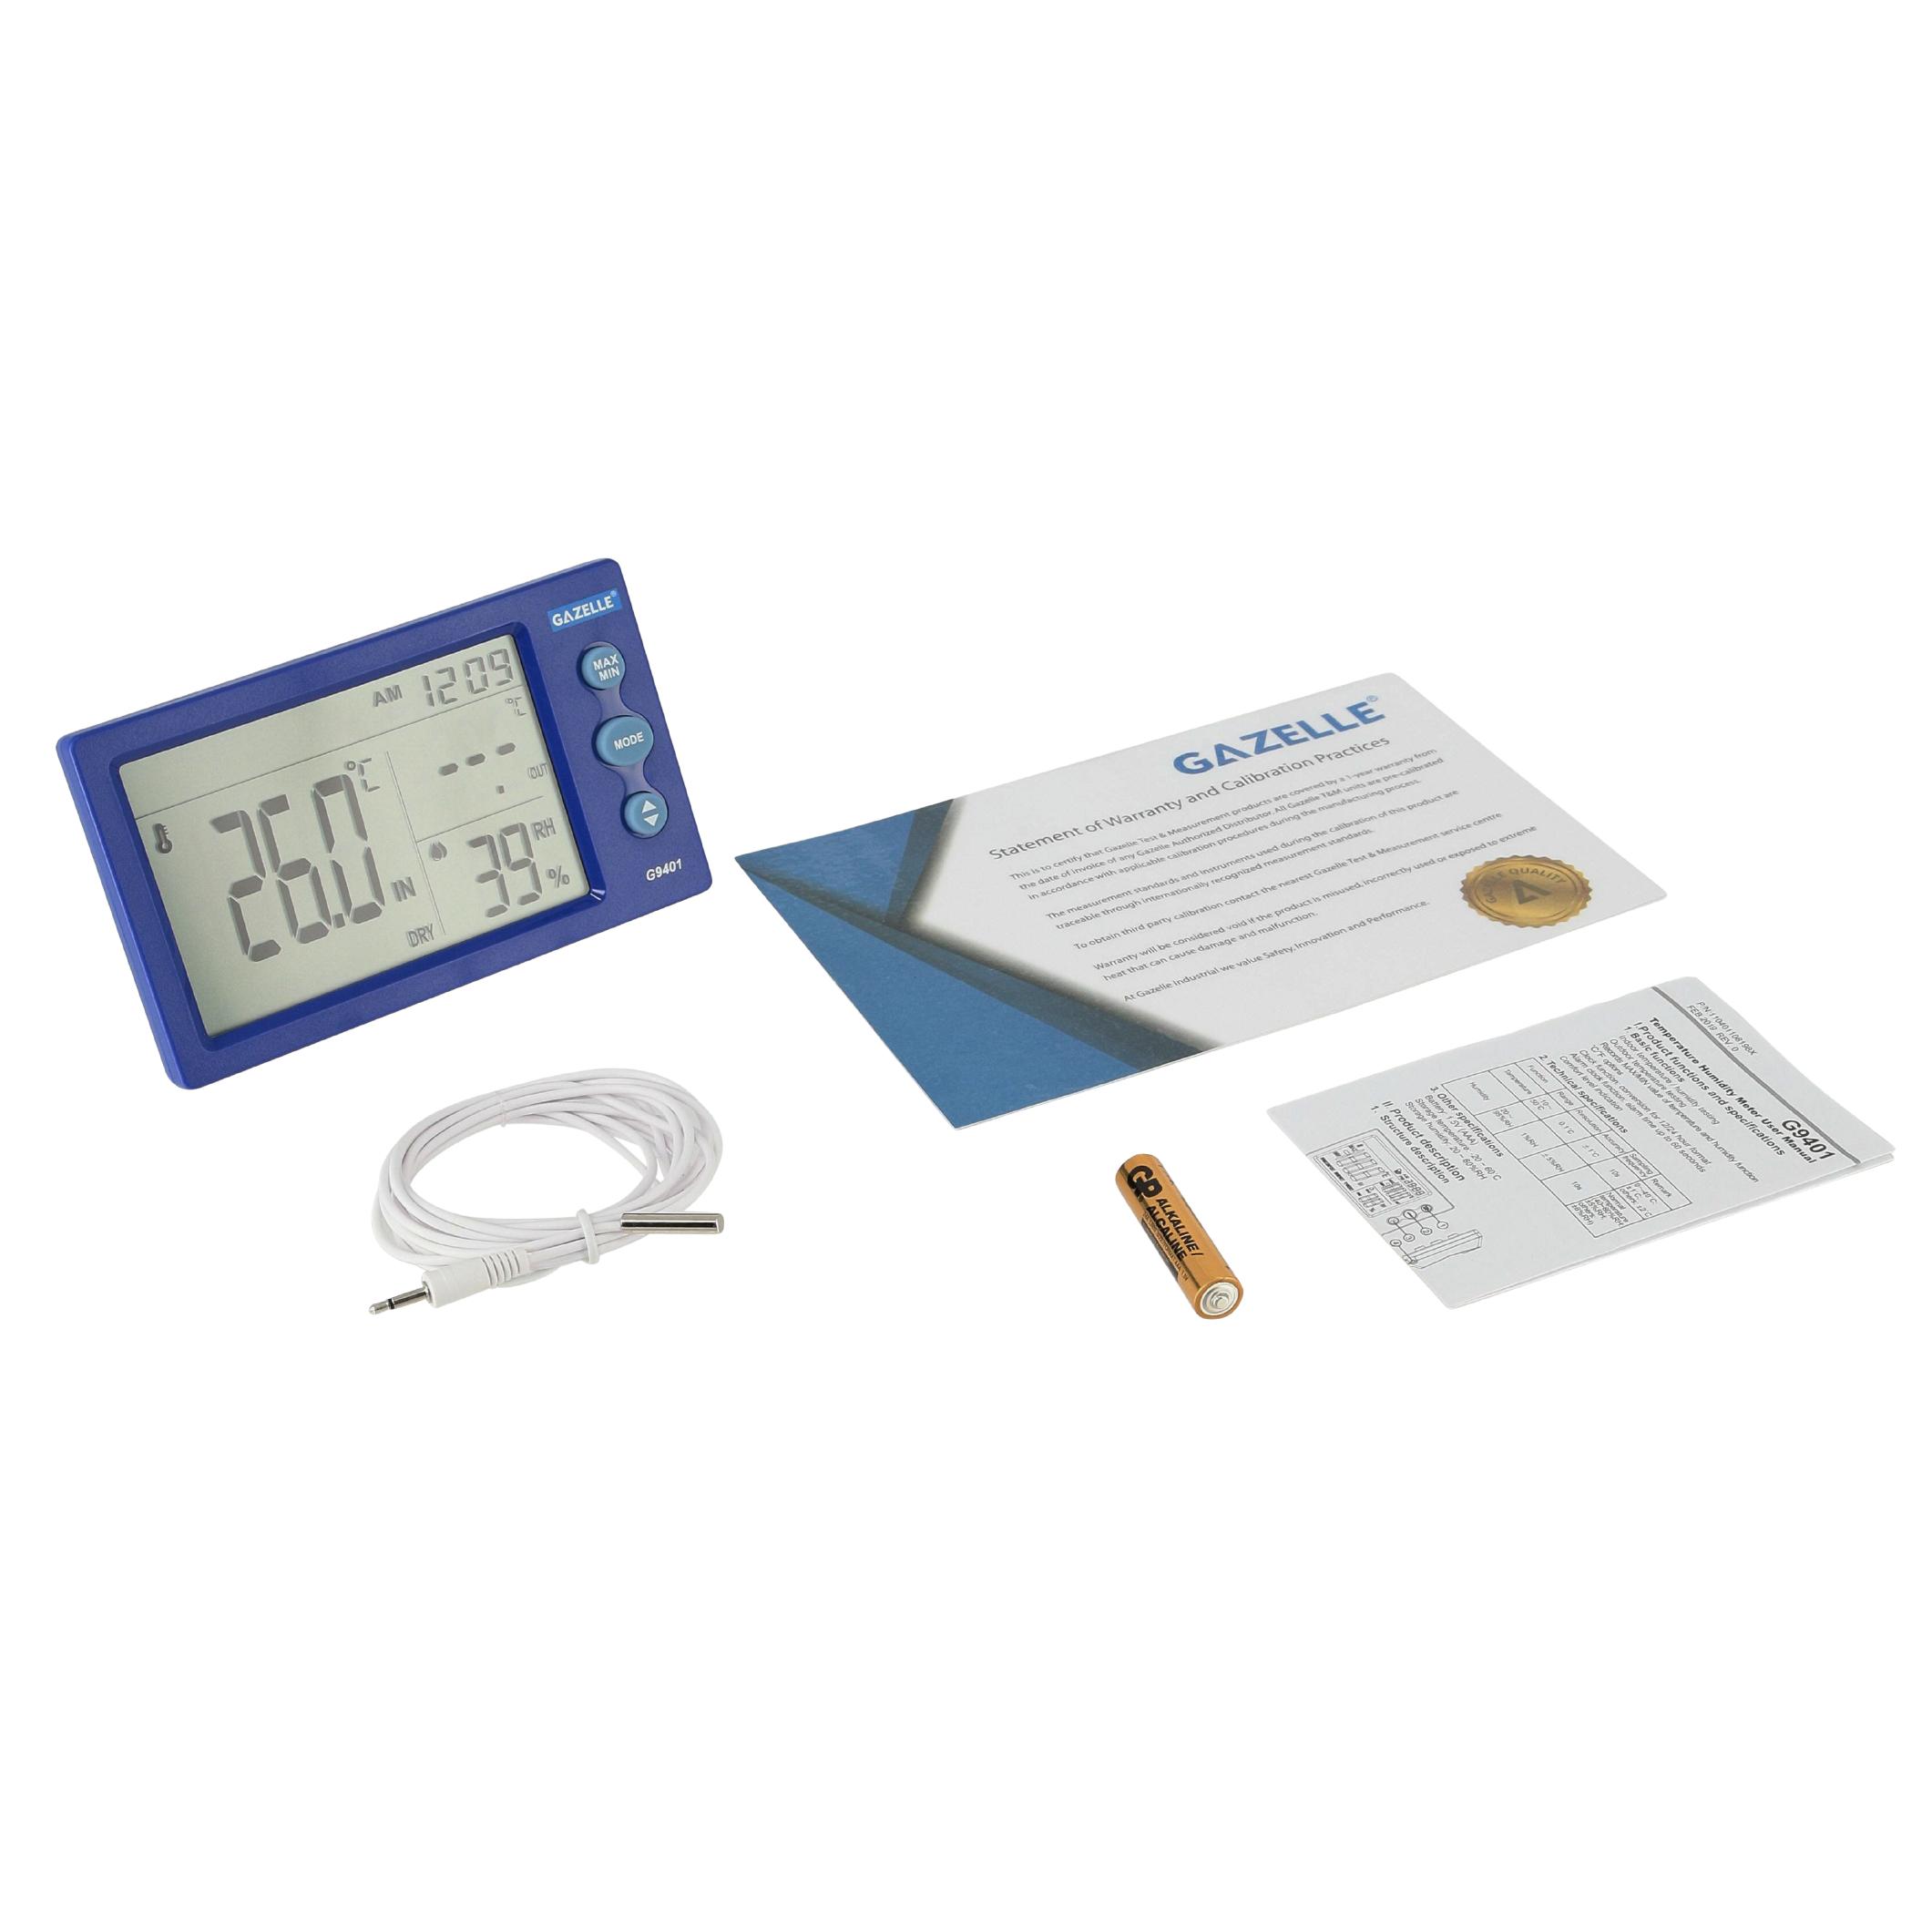 GAZELLE G9401 - Big Digit Temperature Humidity Meter